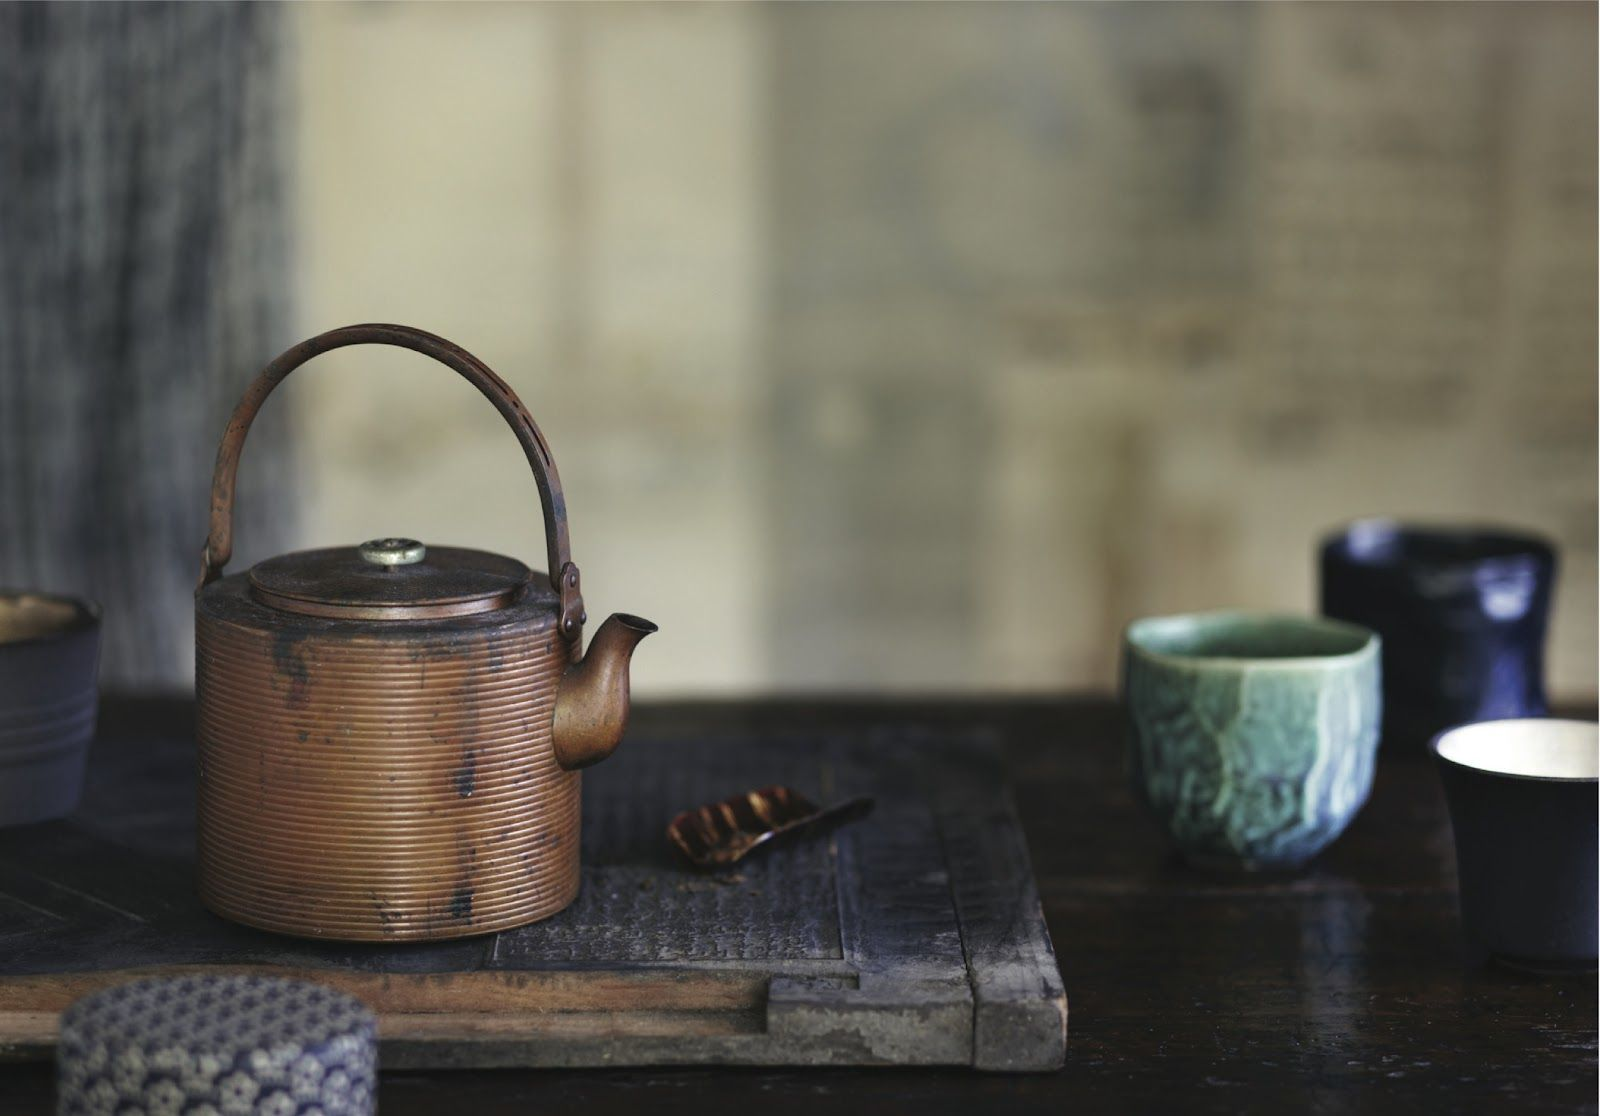 EATspeak - Zenbu Zen - finding food, balance and culture in Kyoto by Jane Lawson -  book giveaway no/2 - see blog for details! valid till 30 oct 2012 - enter now!